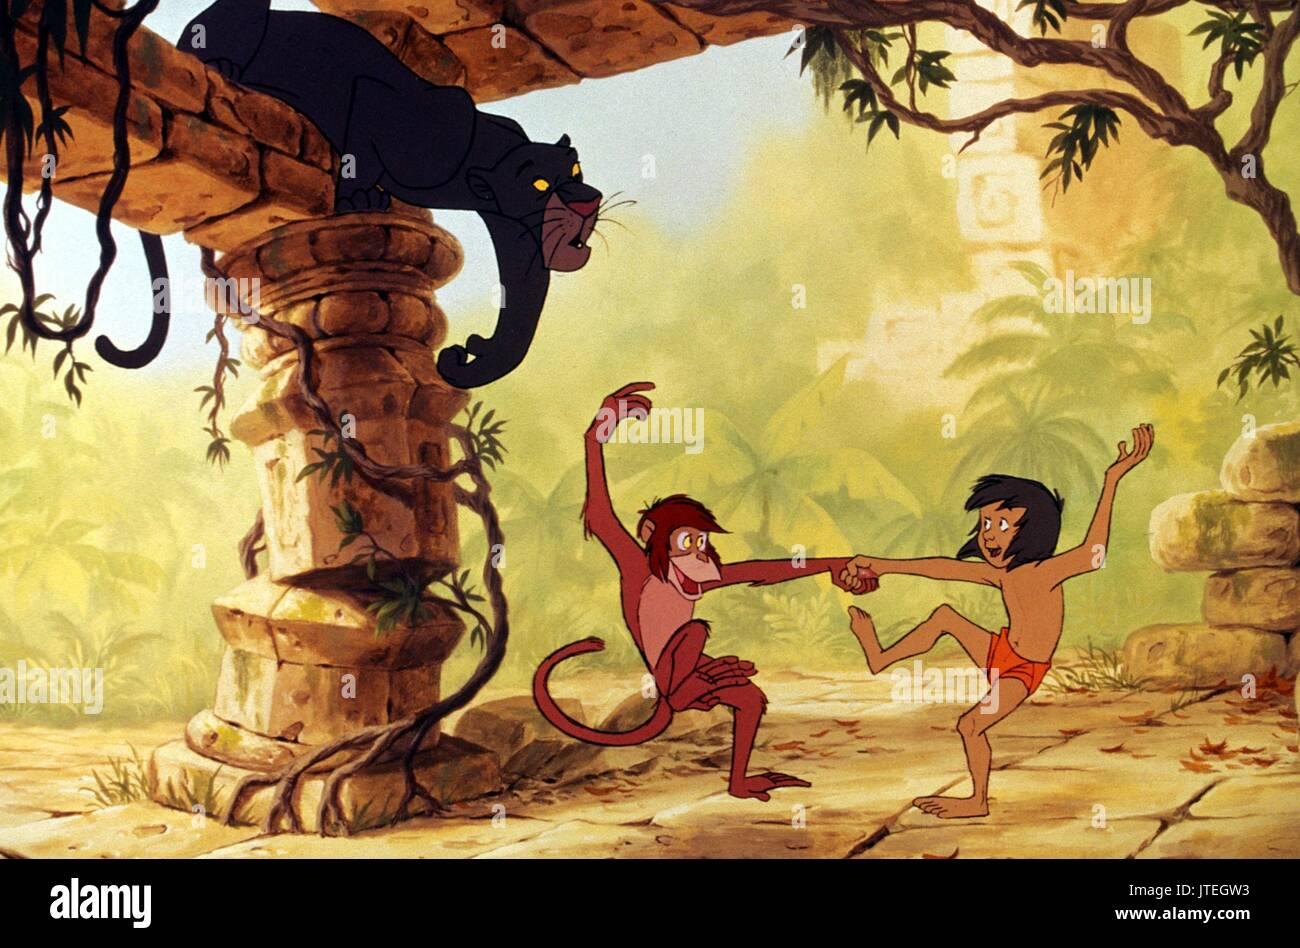 Bagheera Singe Mowgli Le Livre De La Jungle 1967 Banque